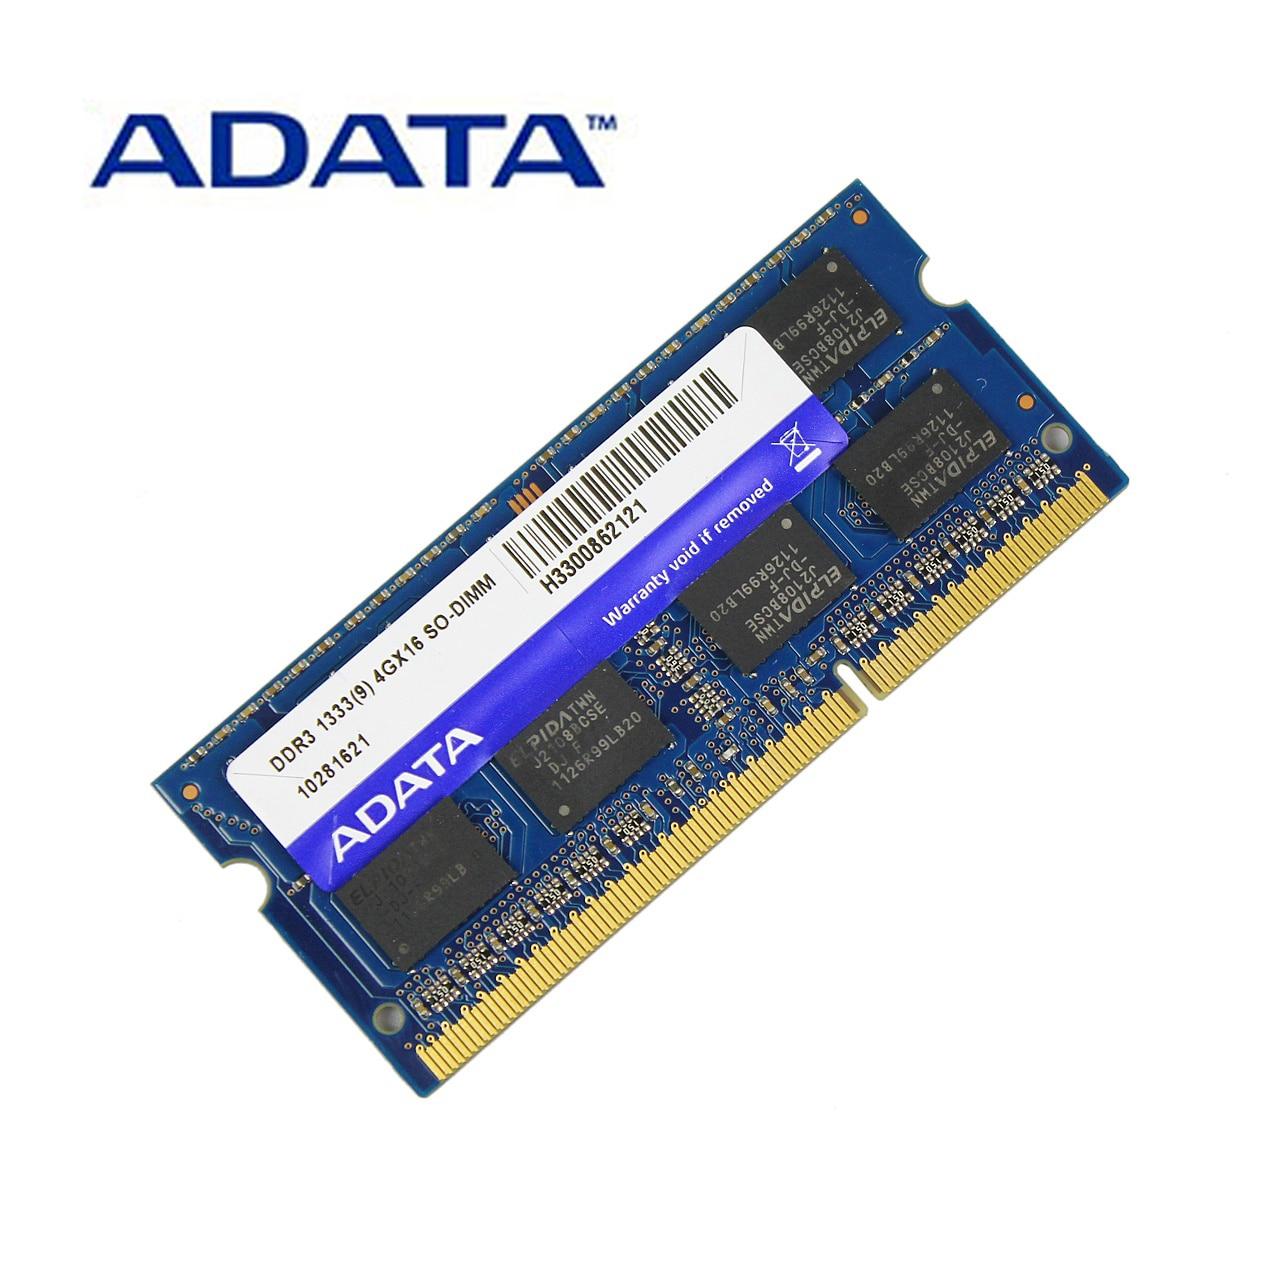 ADATA DDR3 1.5 v 2 gb 4 gb 8 gb 1333 mhz Ram Mémoire SO-DIMM 204 Broches PC3-10600 Pour Lenovo thinkPad SONY Acer SAMSUNG HP Ordinateur Portable Béliers